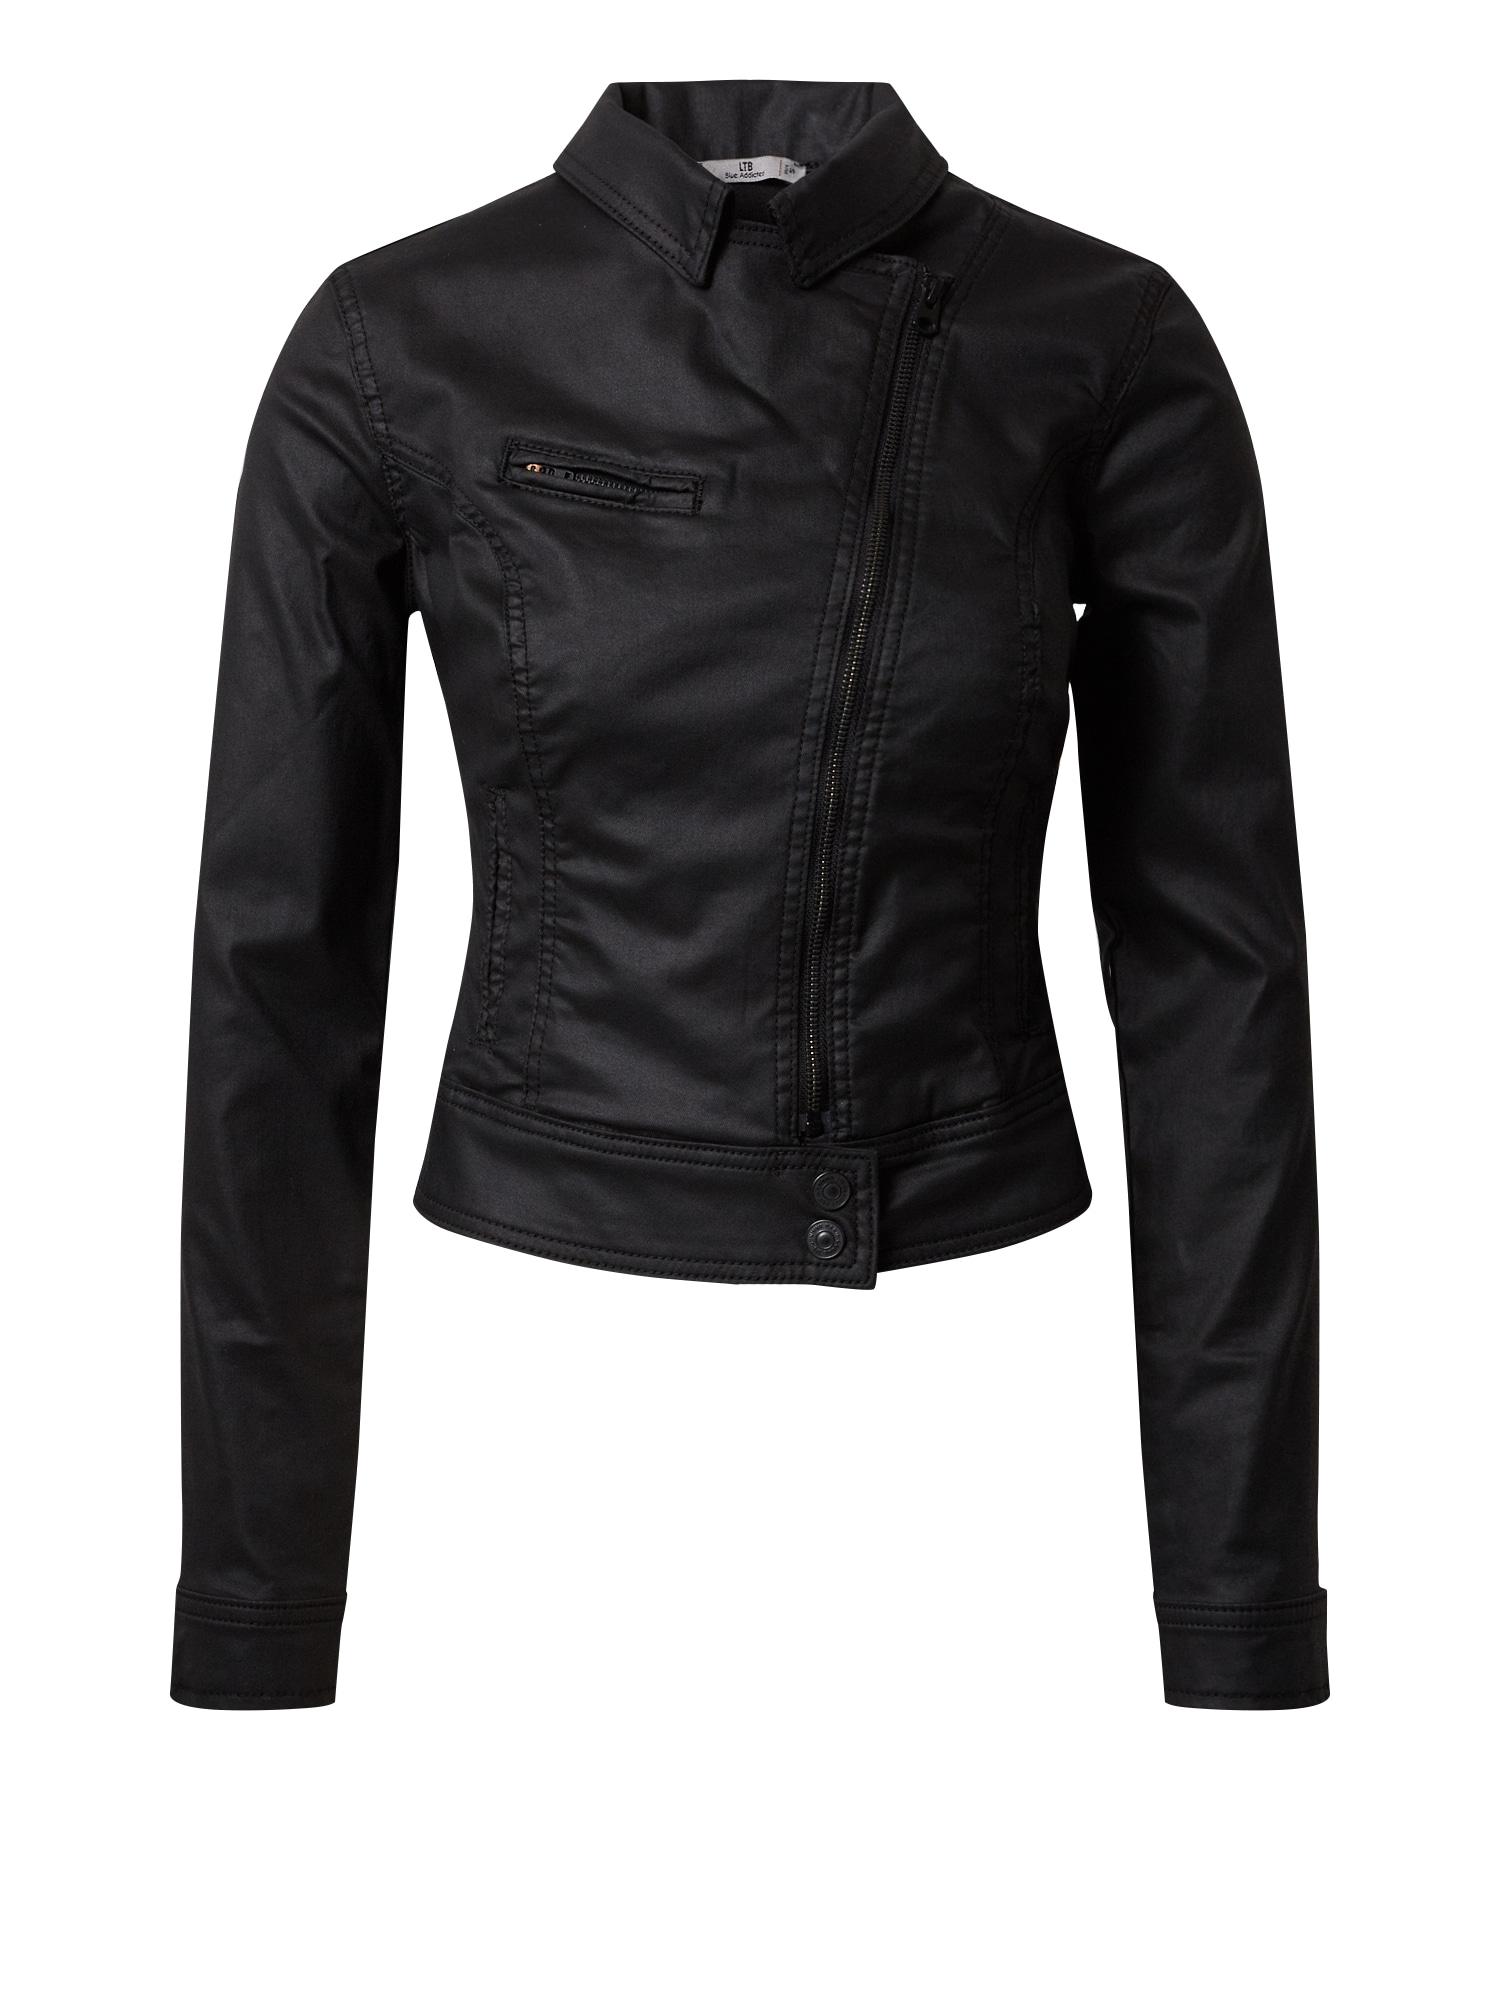 LTB Demisezoninė striukė 'Ellen' juodo džinso spalva